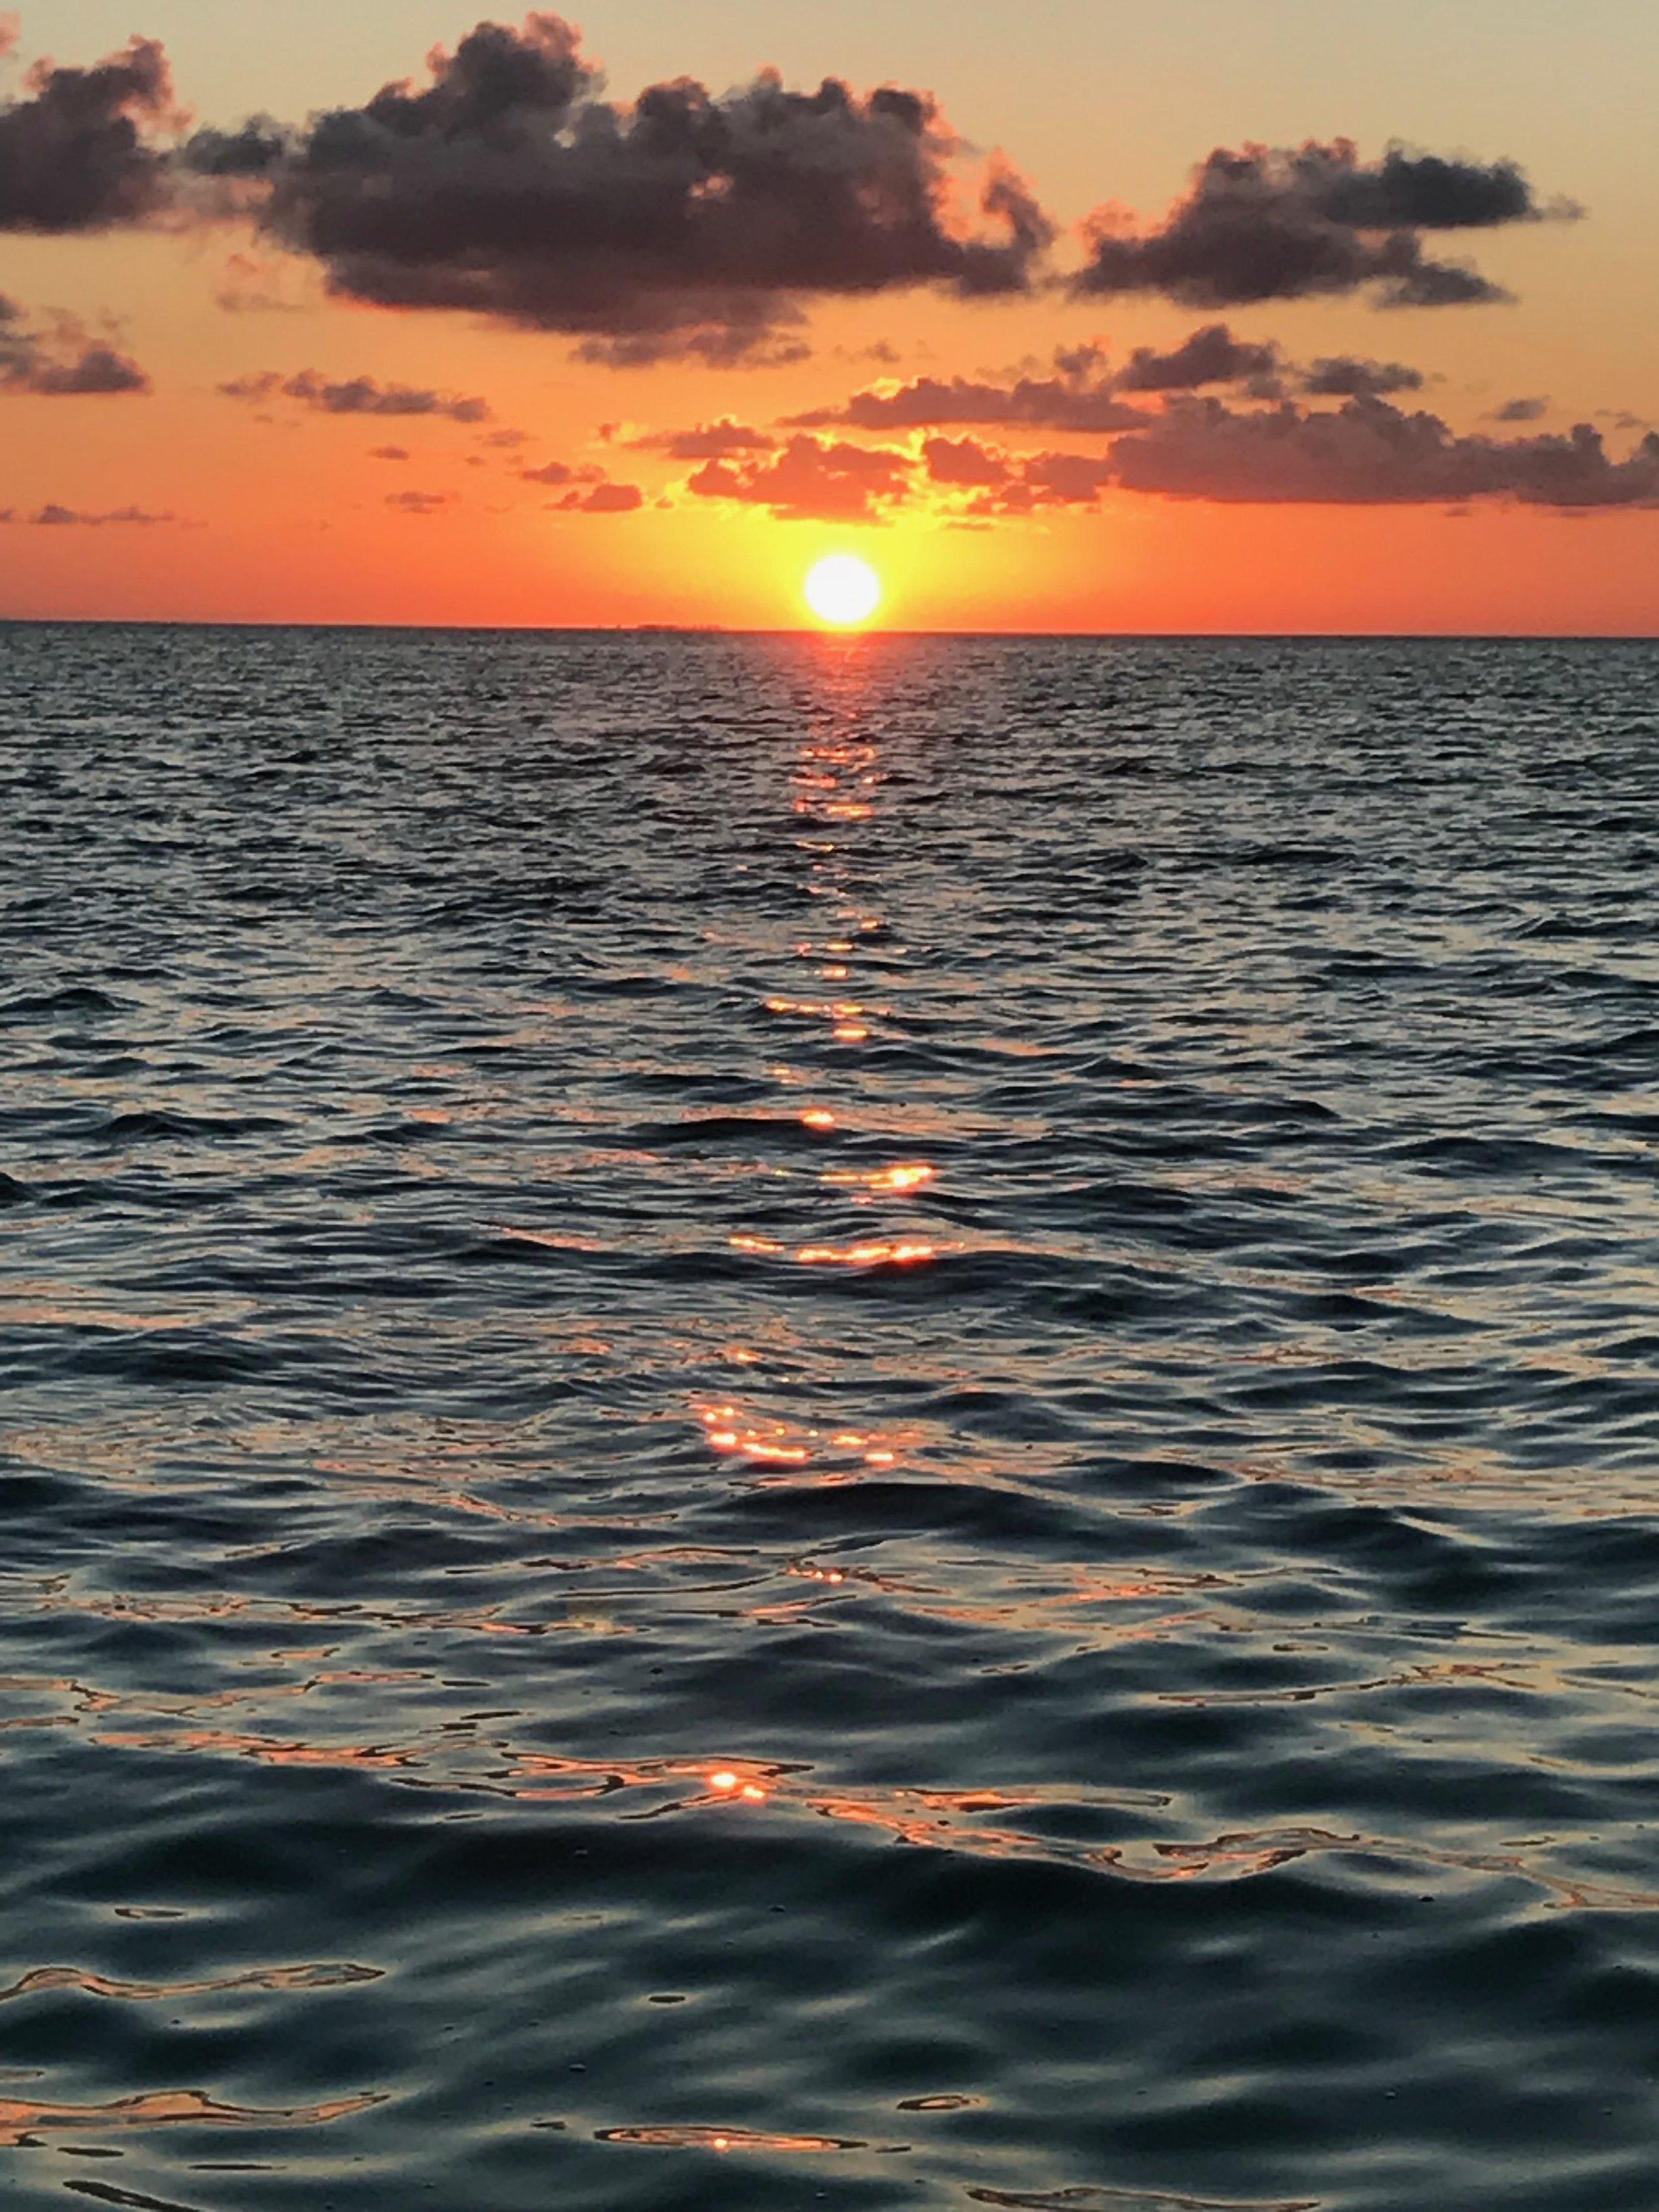 Bacalar Chico Sunset